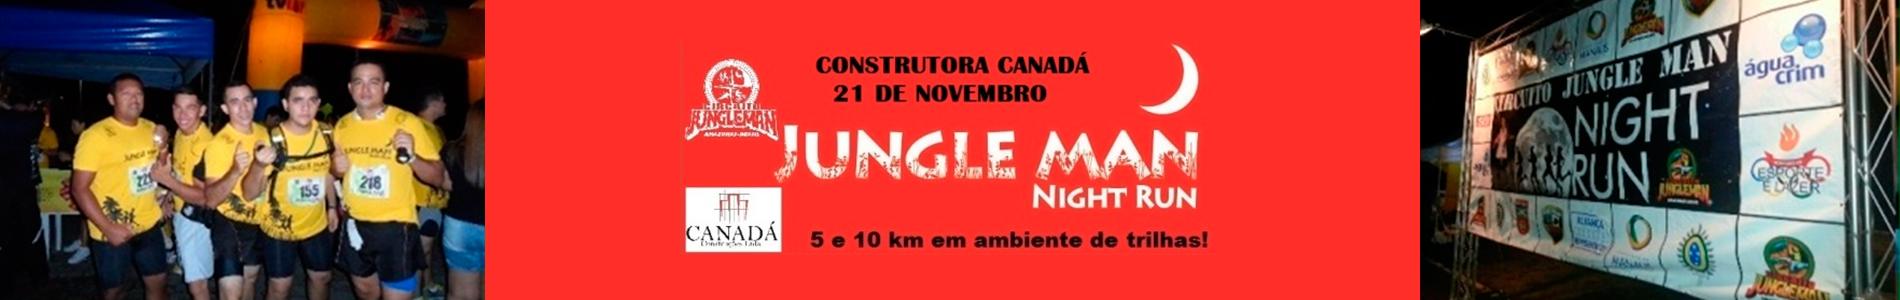 JUNGLE MAN NIGHT RUN - 4ª ETAPA - CONSTRUTORA CANADÁ - Imagem de topo